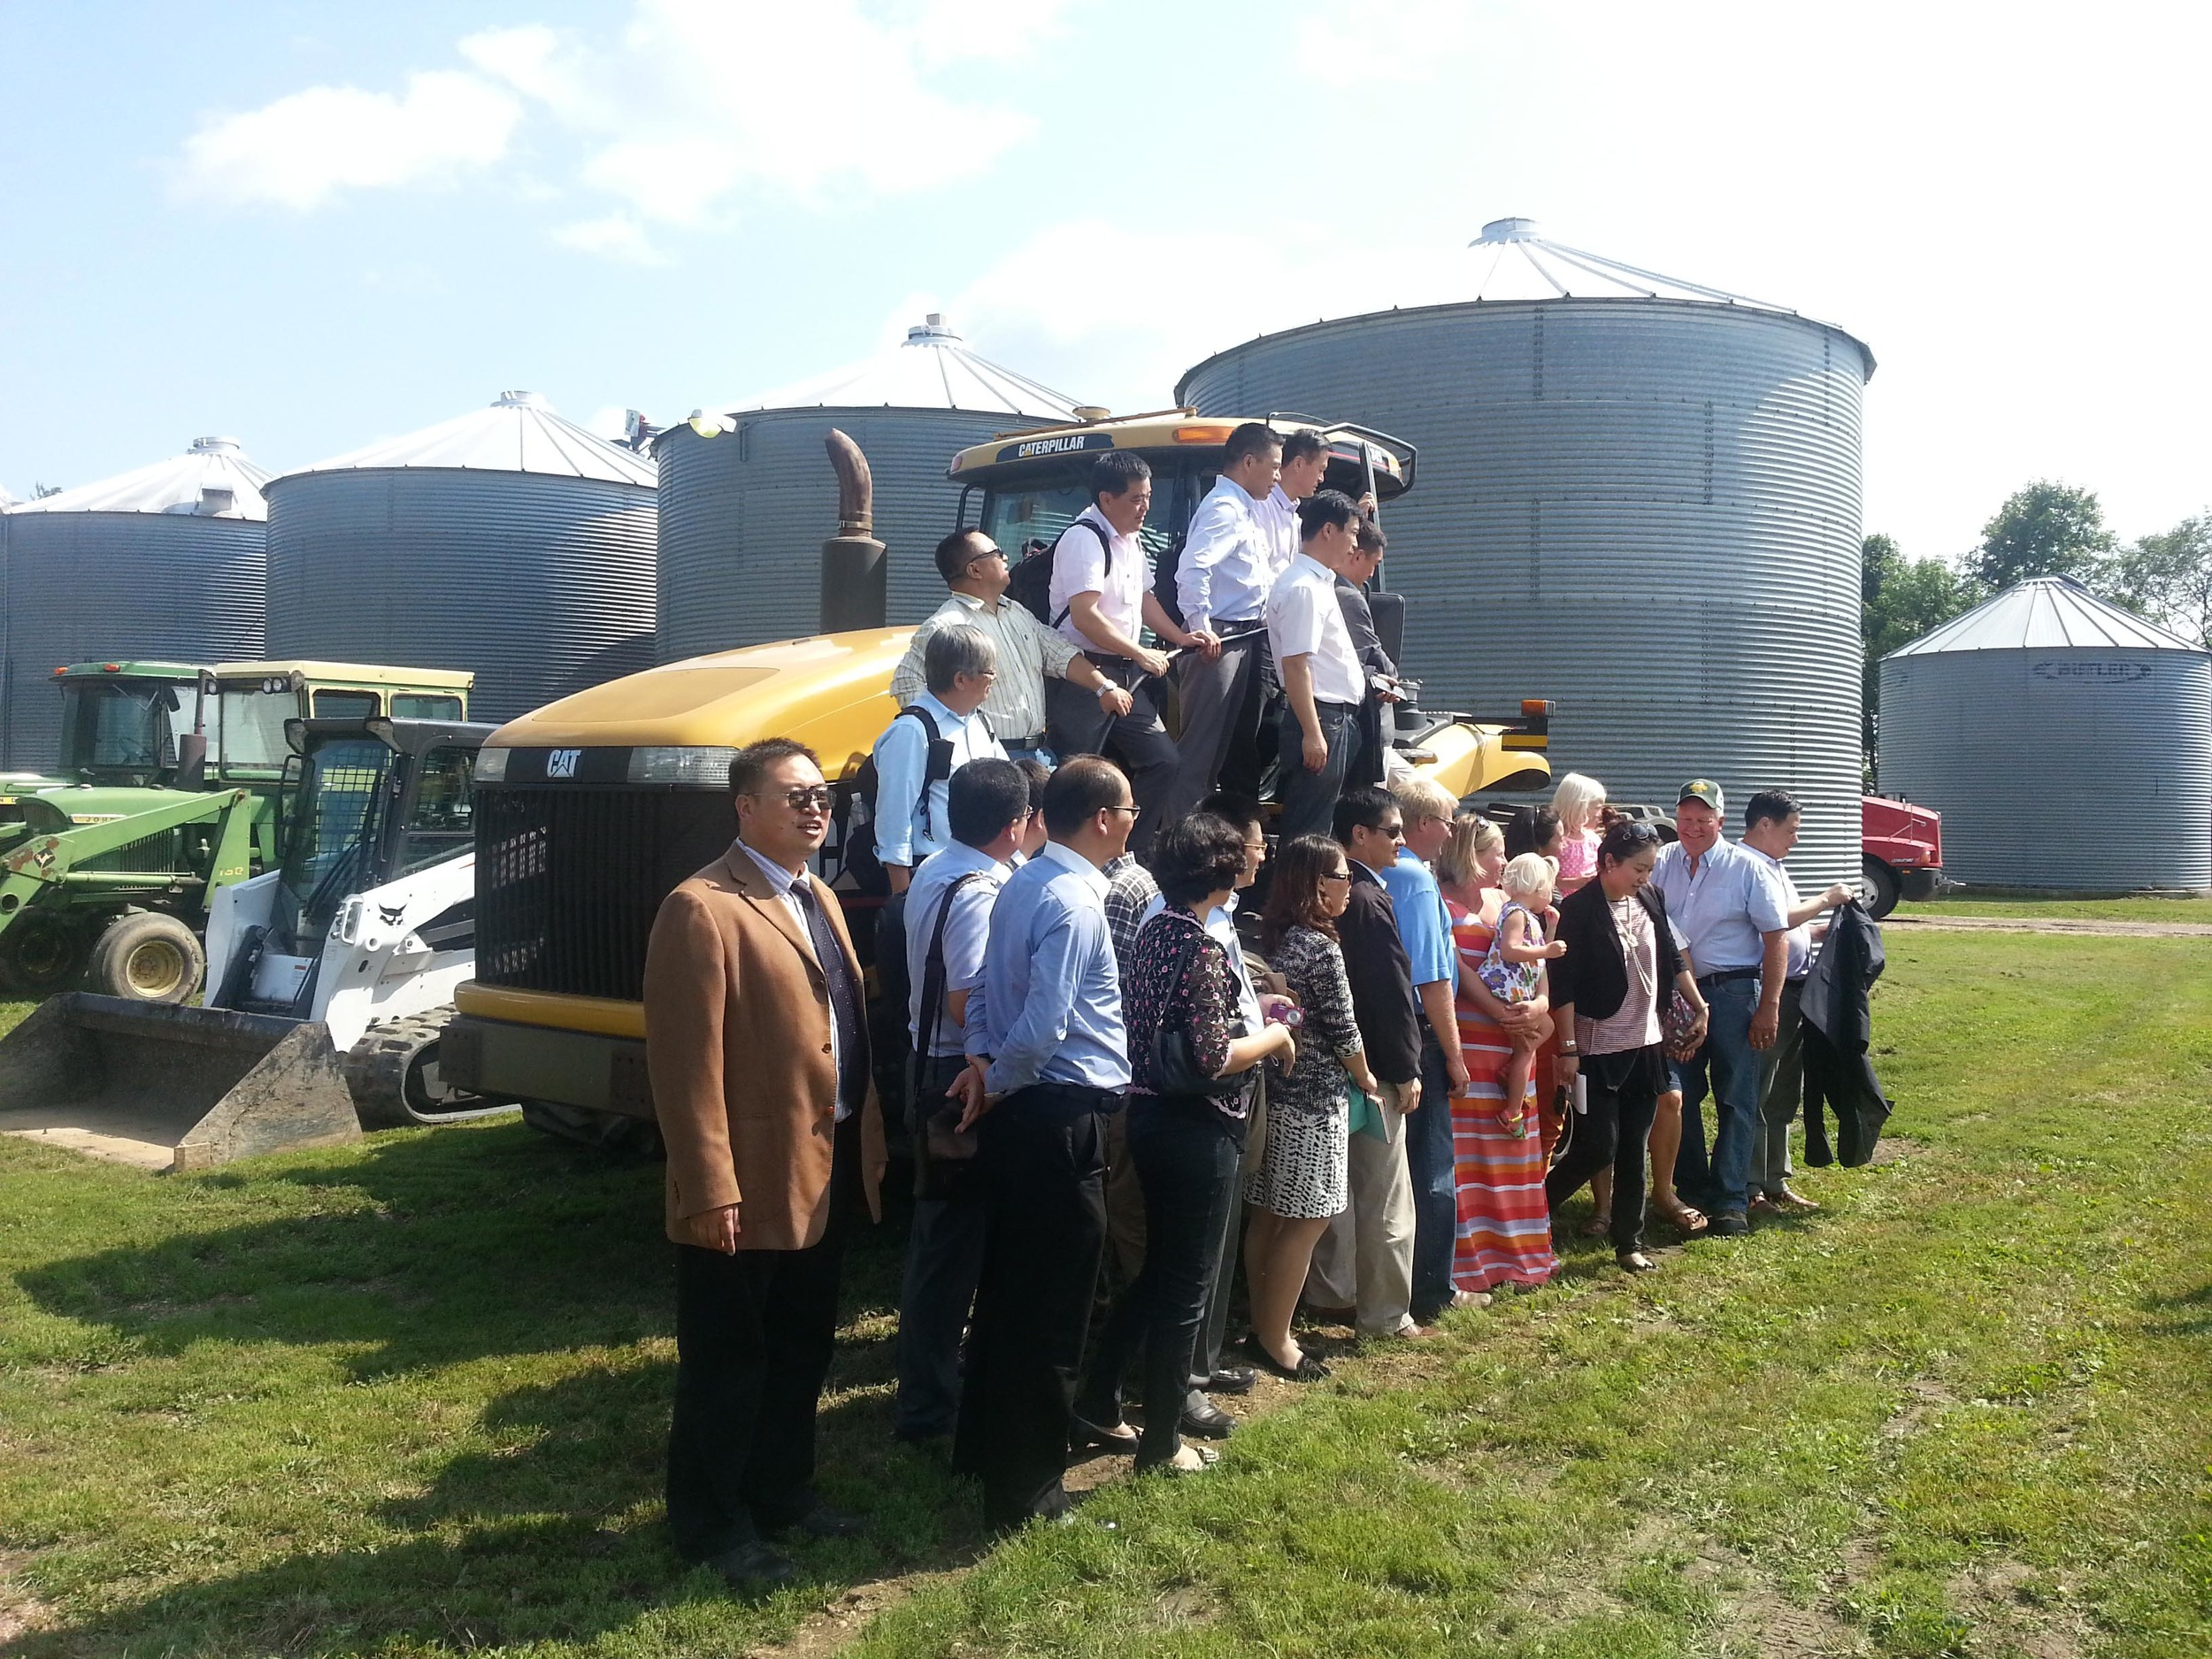 2014 China Feed Manufacturing SC at Scott Gauslow's farm 3.jpg